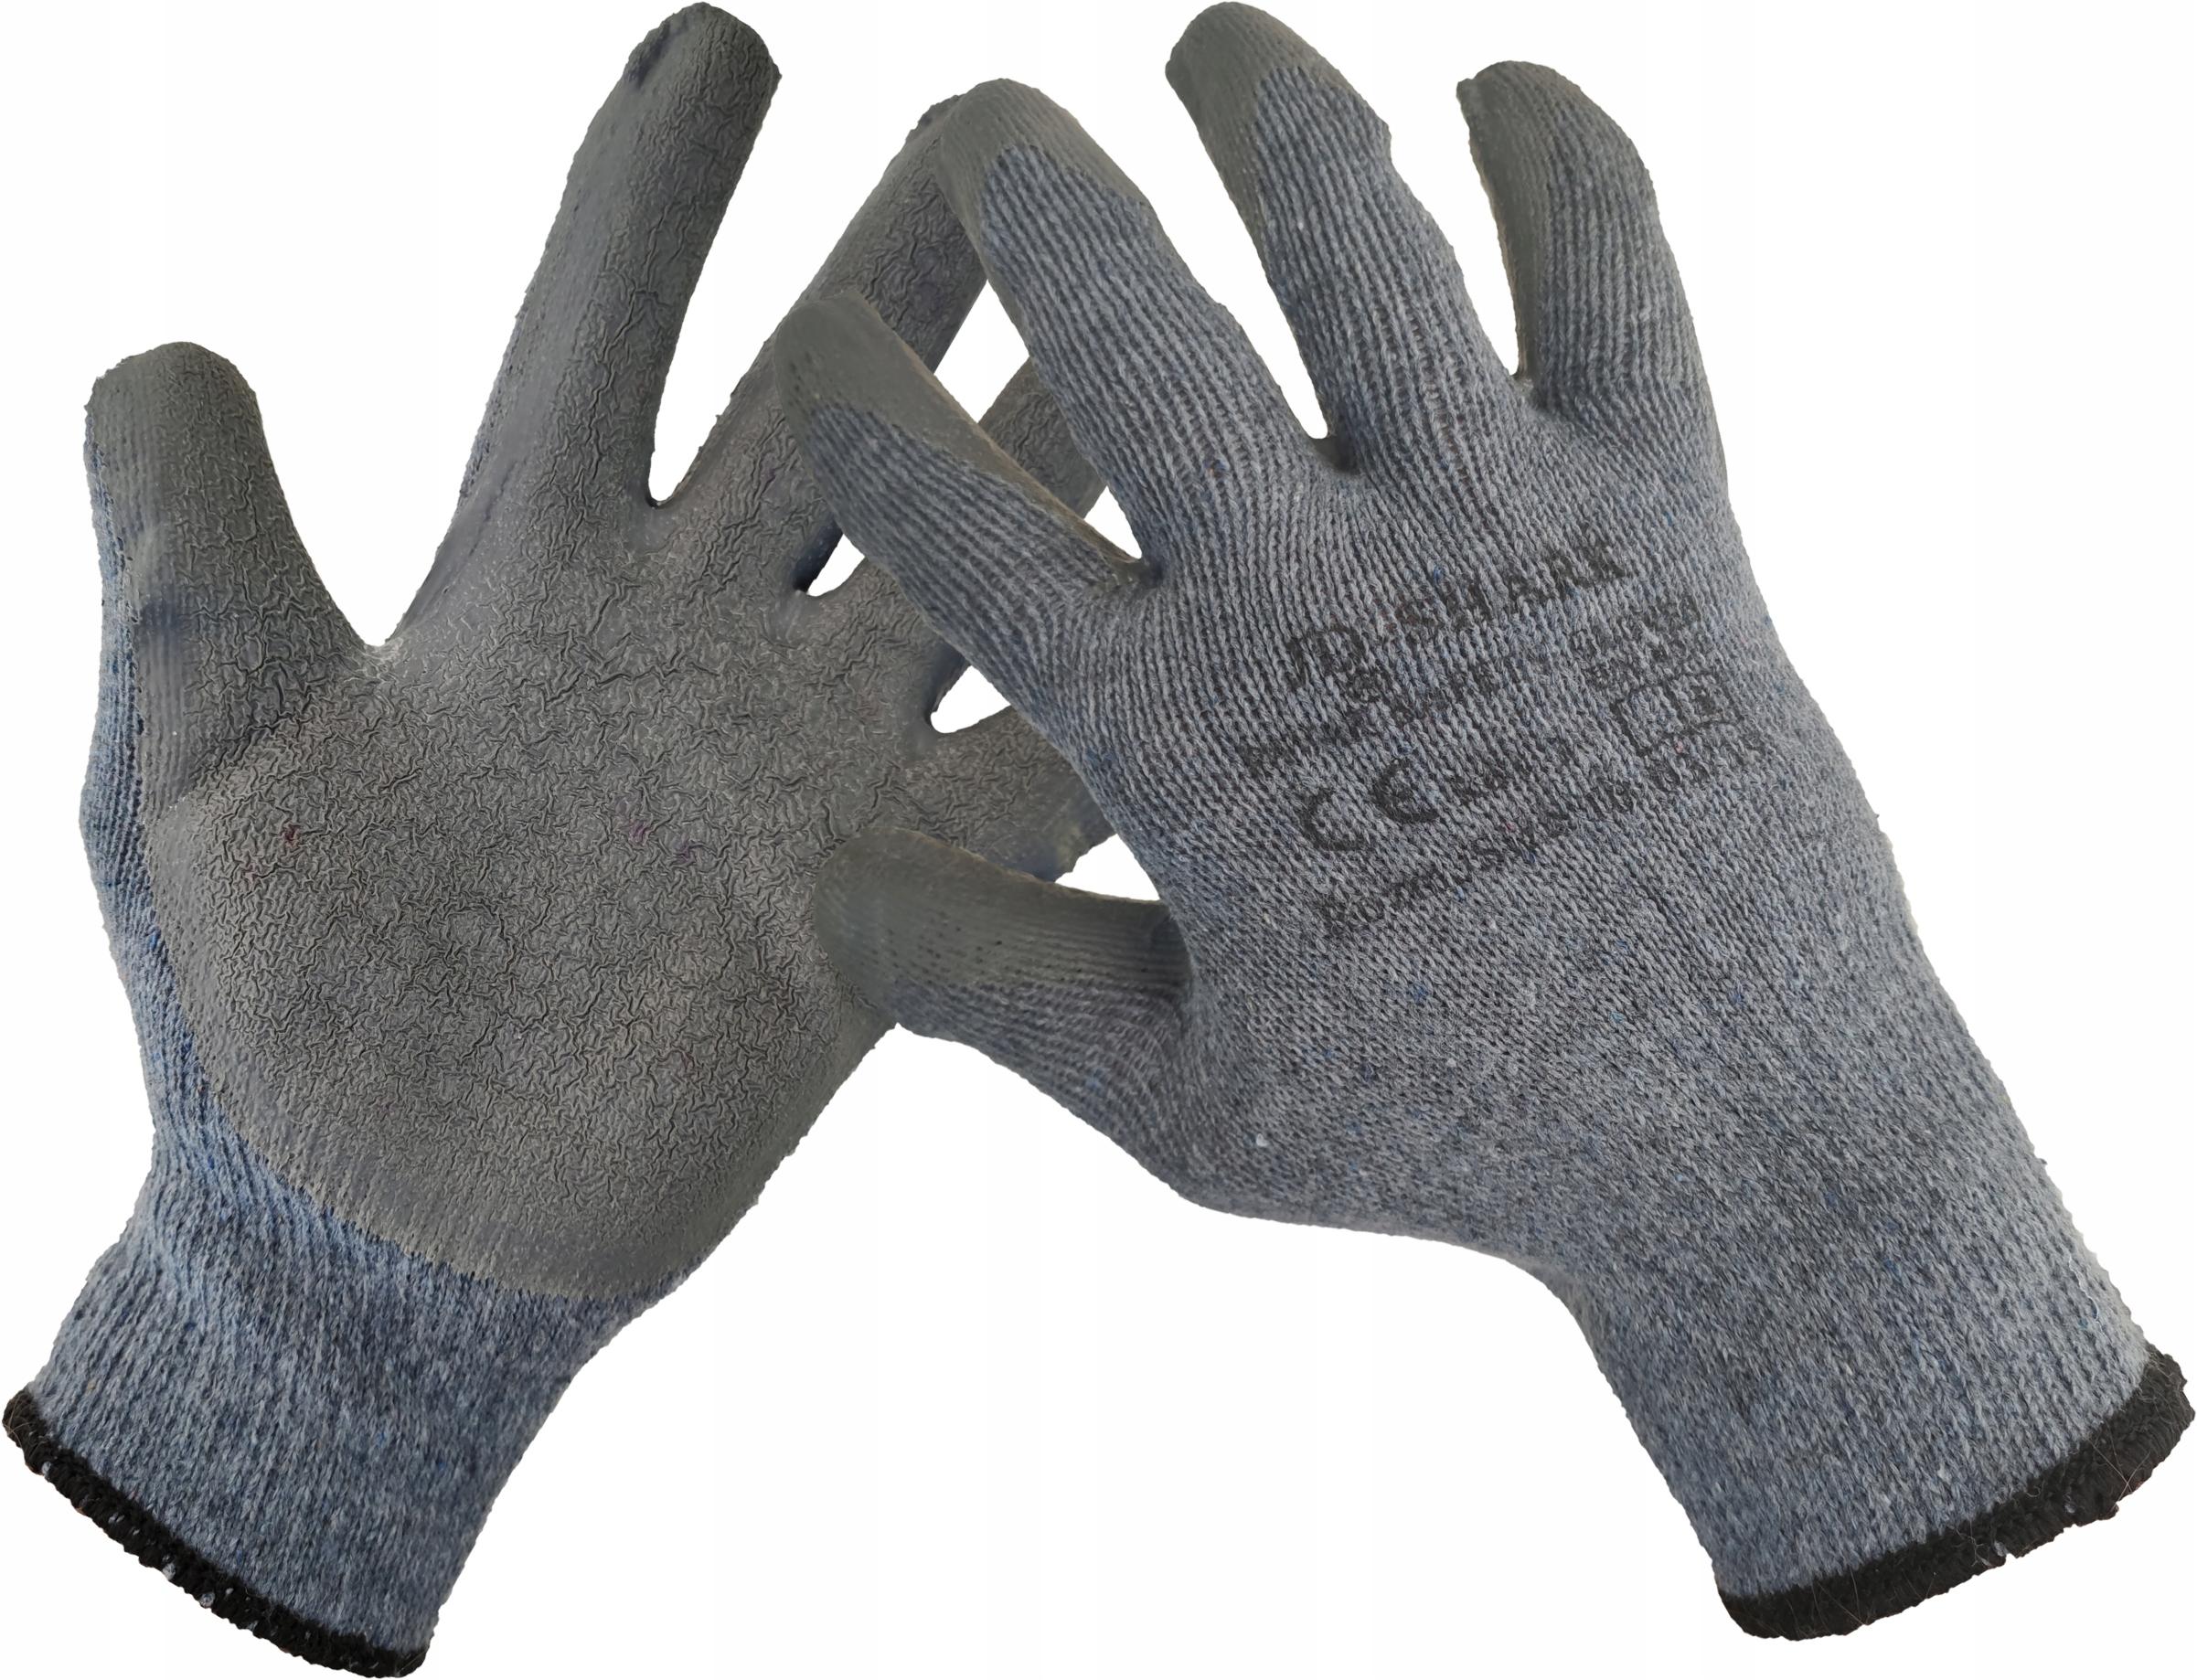 Rękawice ochronne JD-SHARK porowate MOCNE 10 par